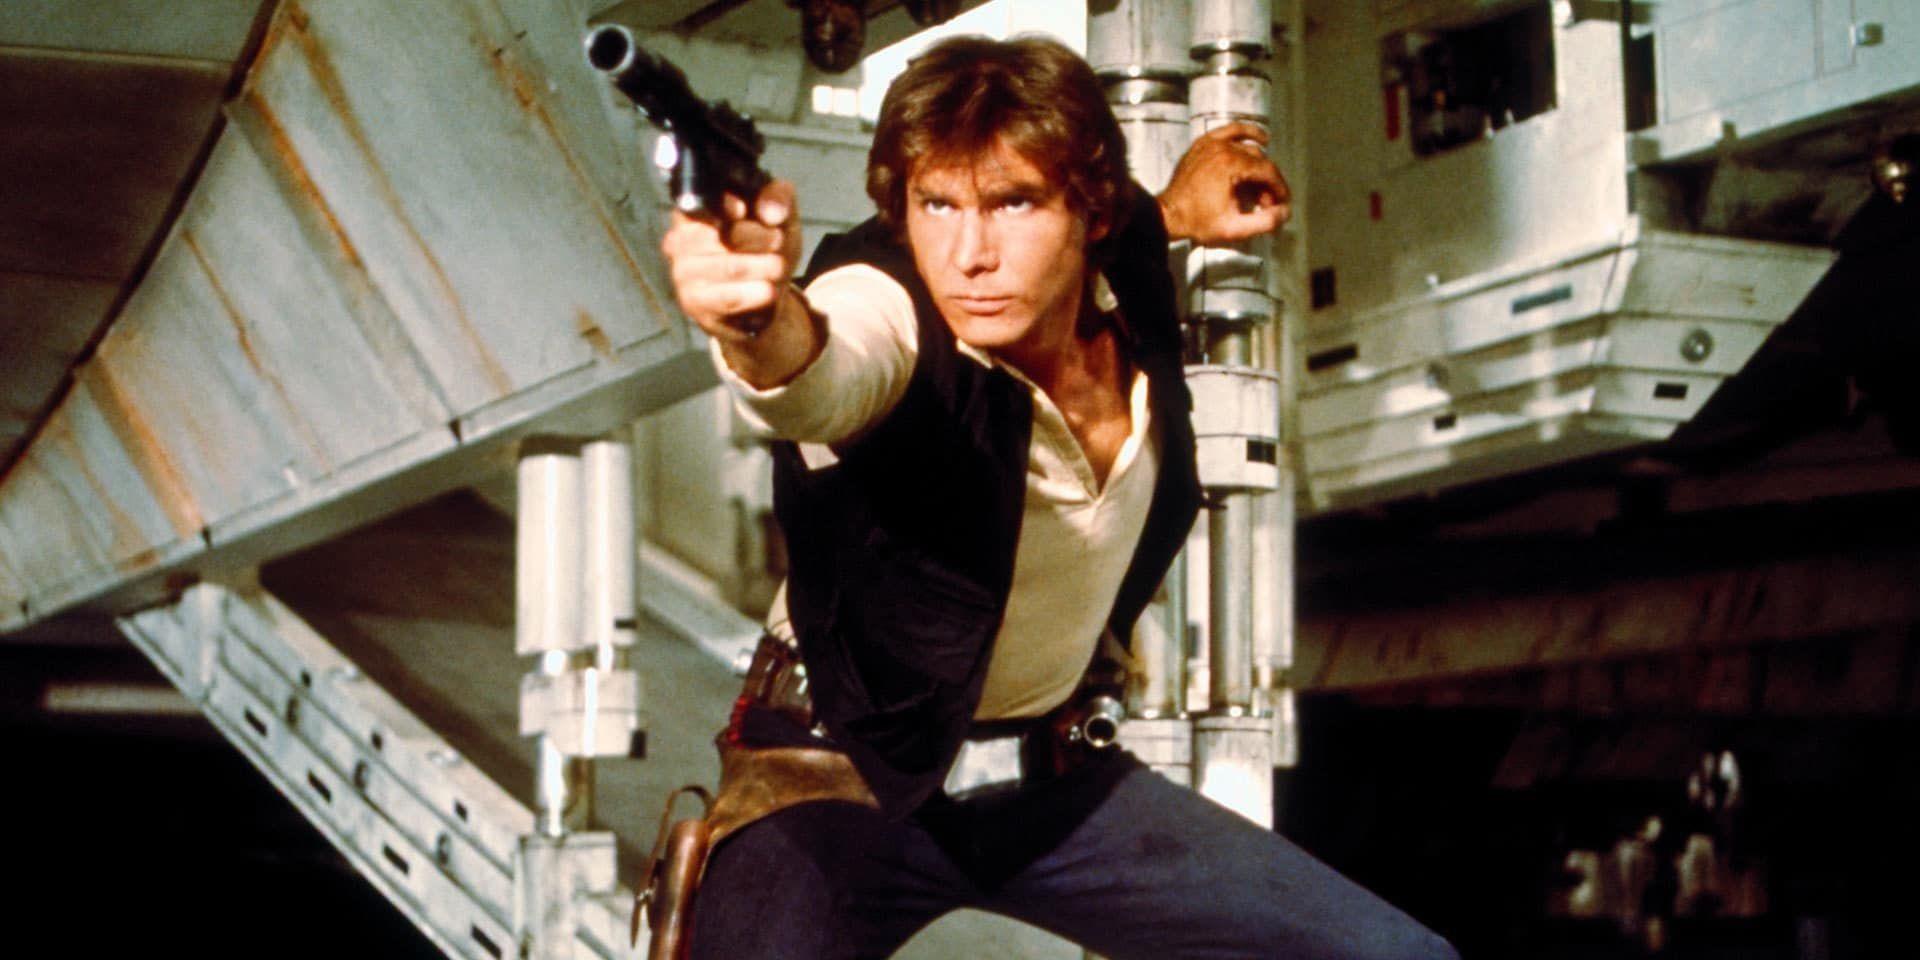 STAR WARS Galactic Heroes Taun Taun w// Han Solo Hoth Empire Stikes Back